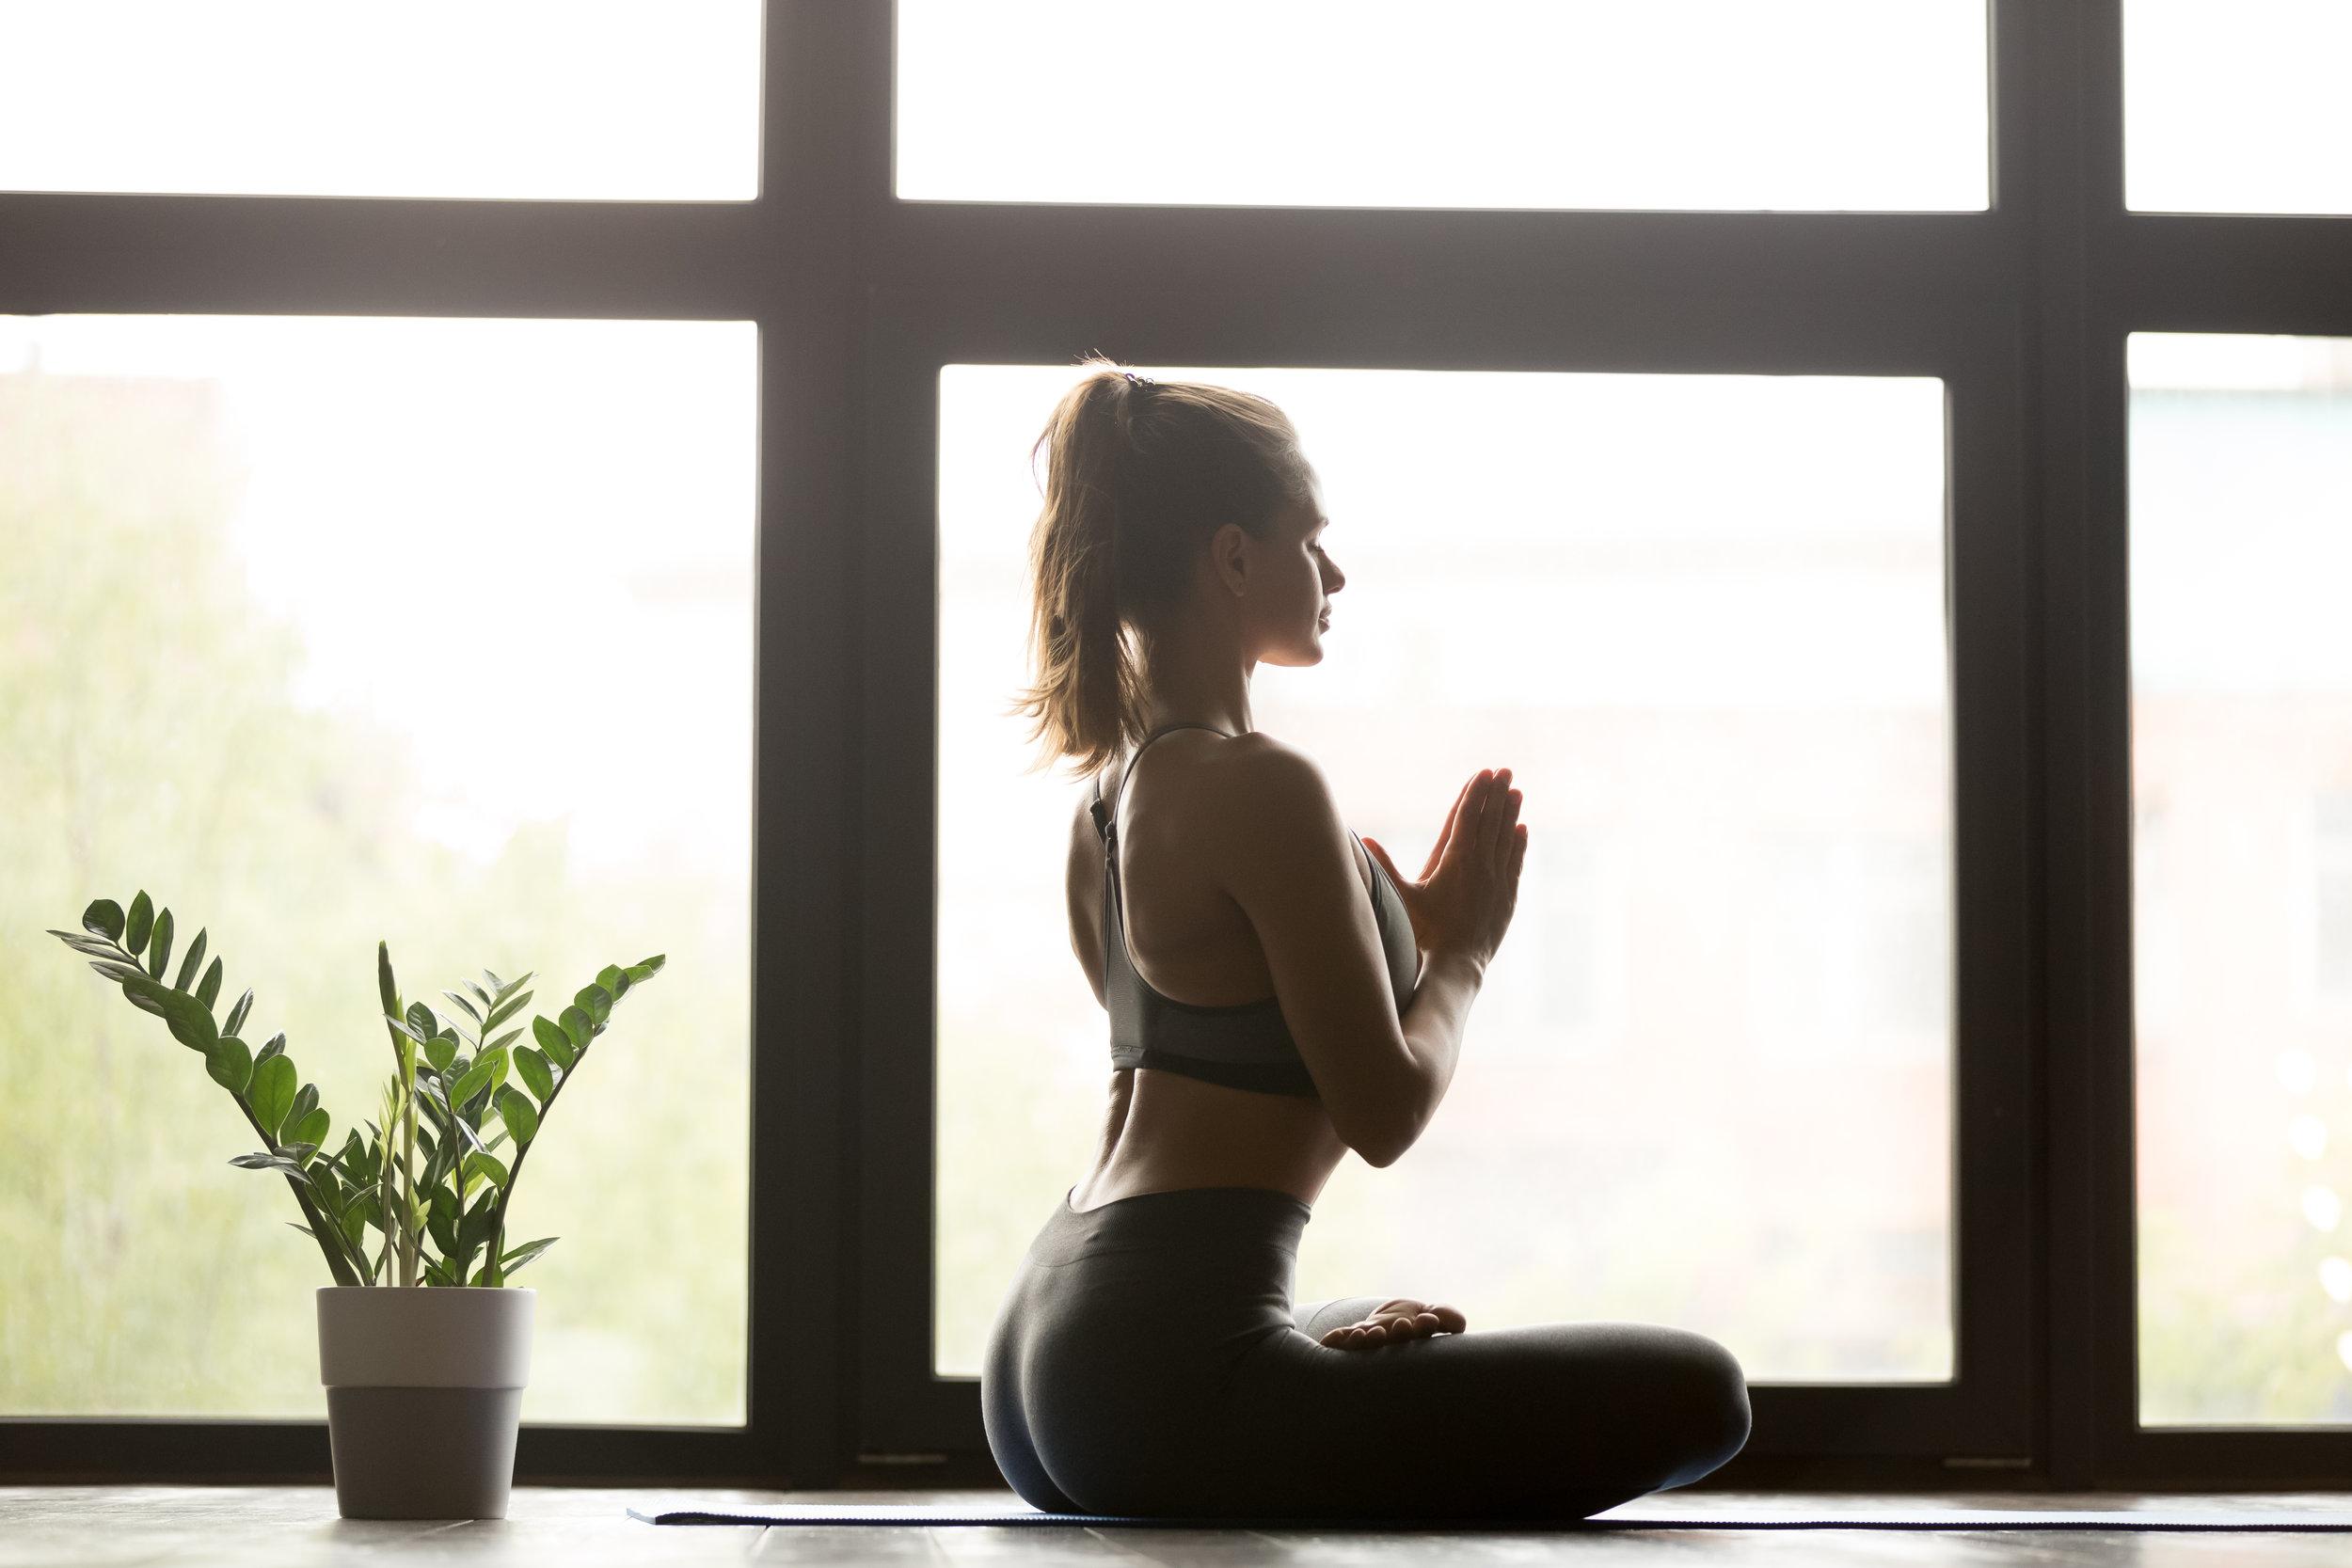 EMBODY DAILY LUXURY | WELLNESS | SELF-CARE | YOGA